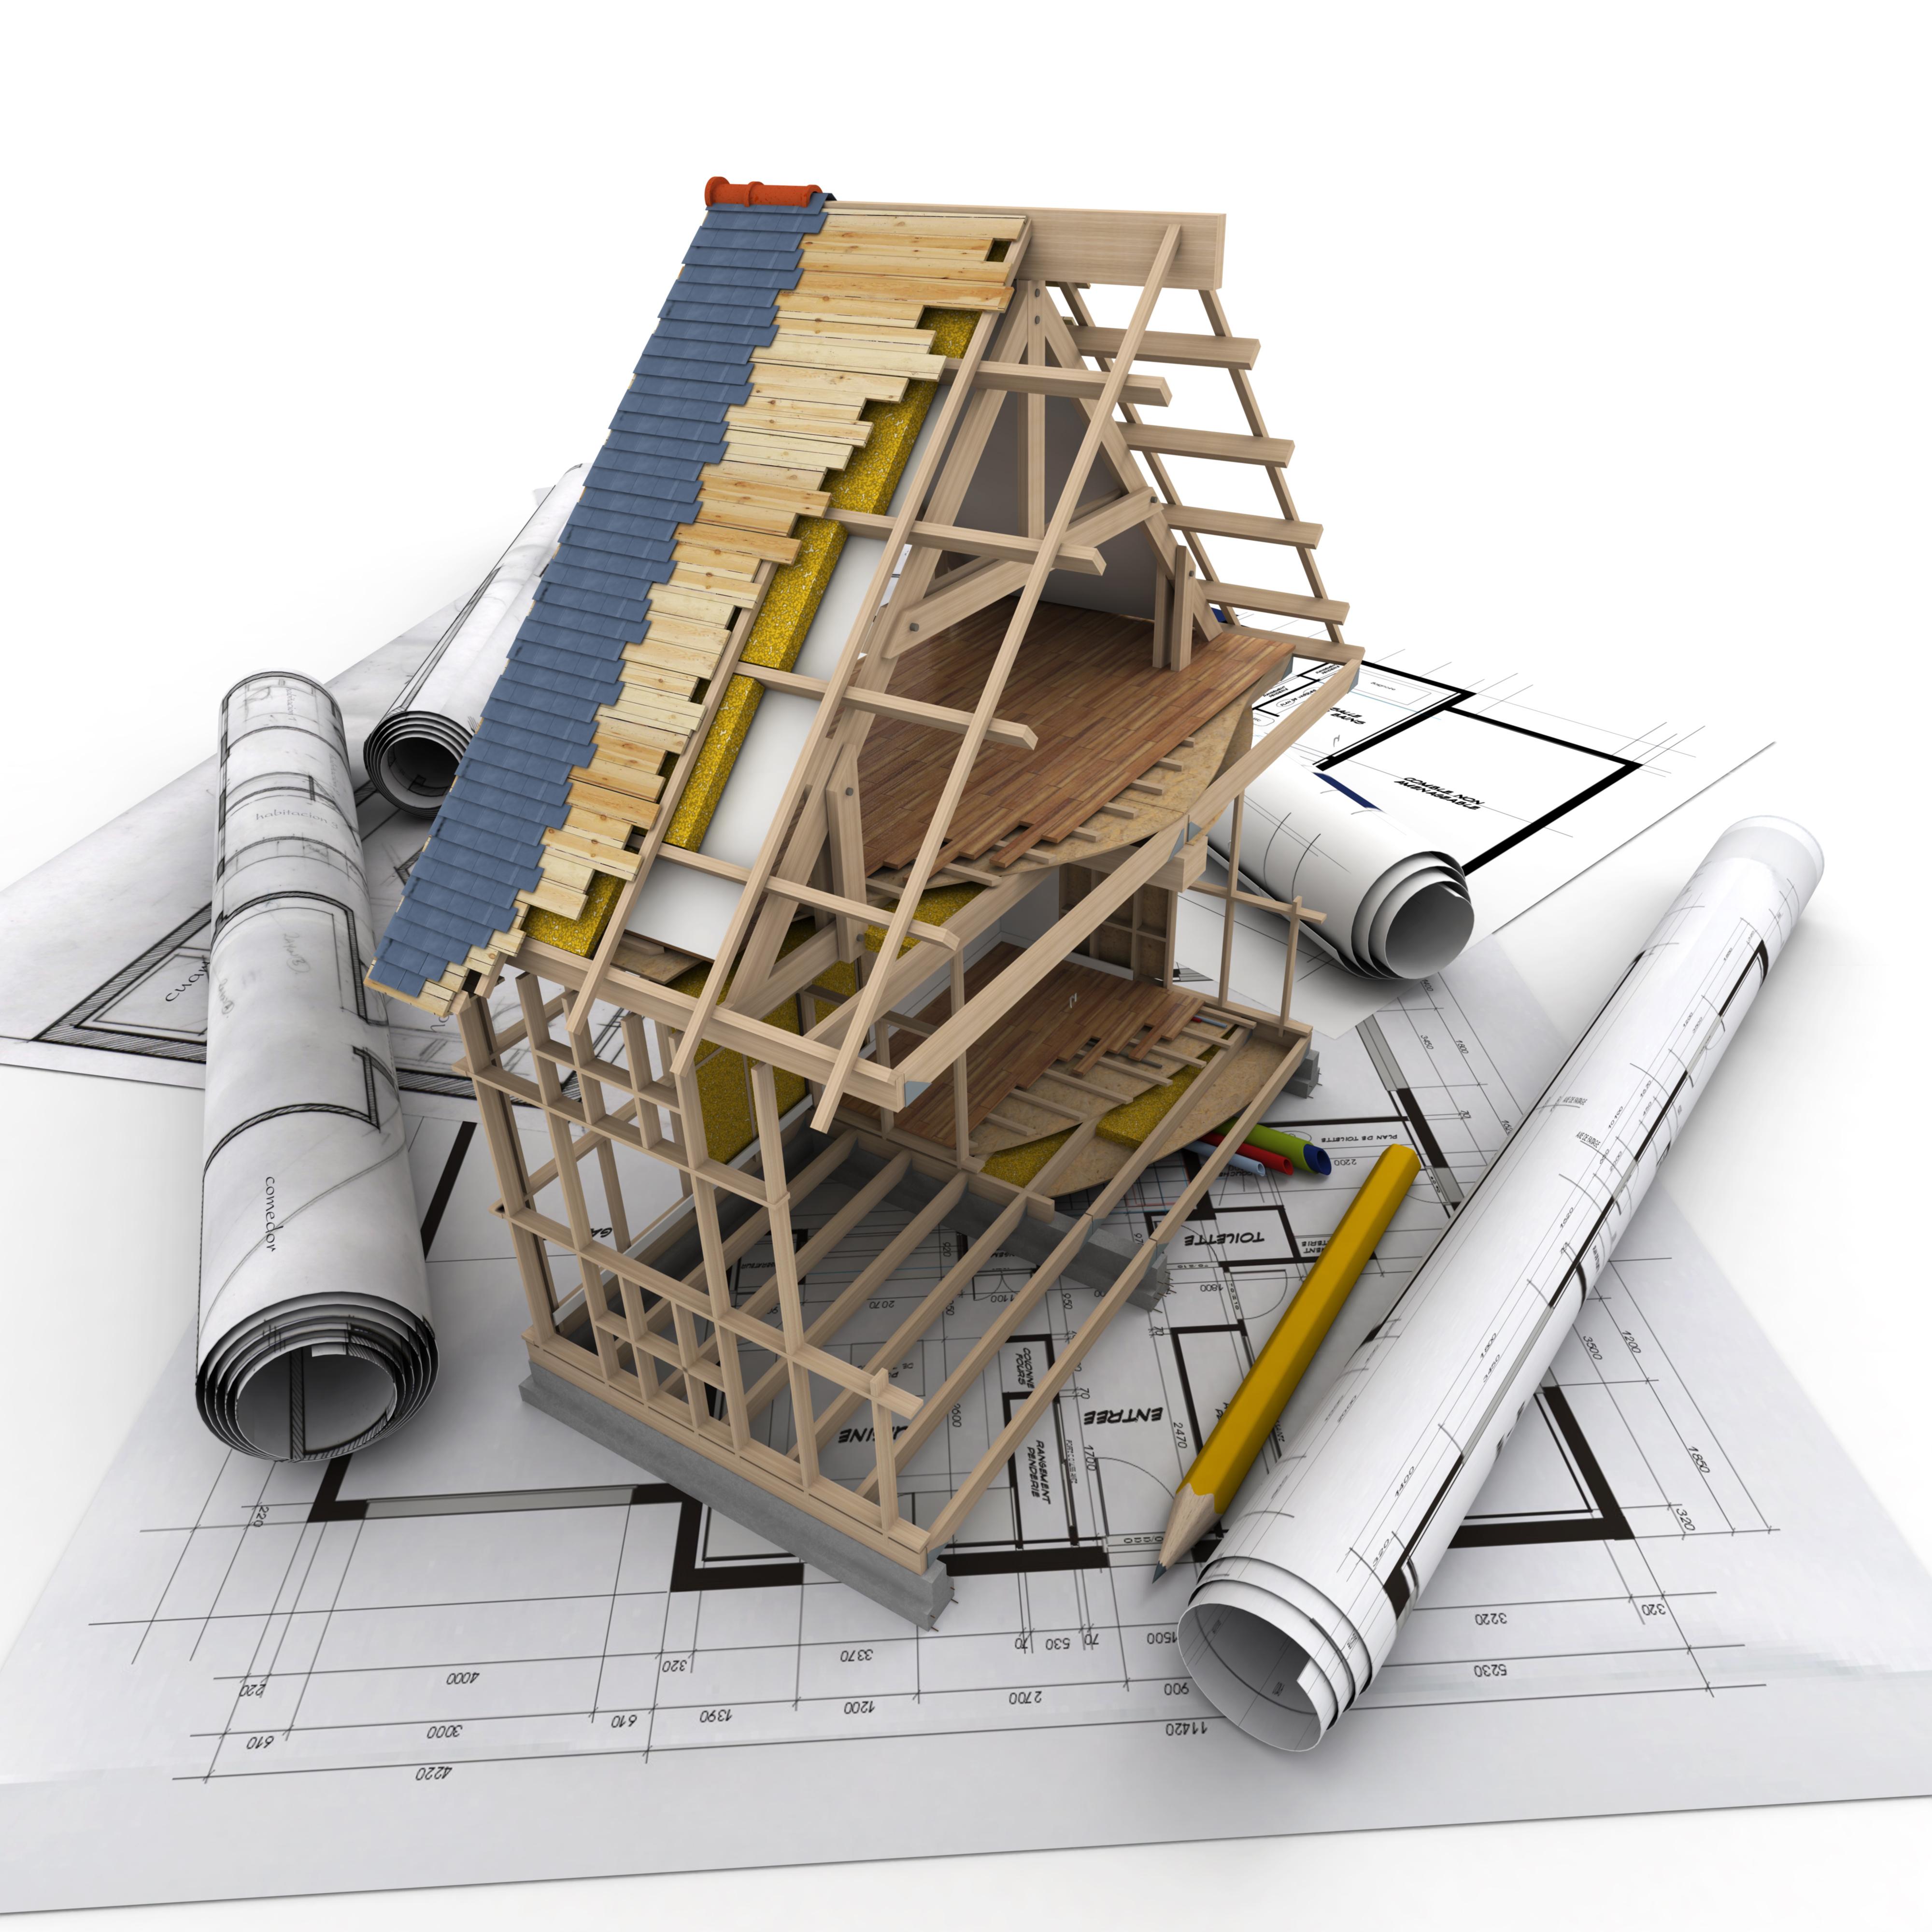 Guida al bonus 50 per interventi di ristrutturazione serramenti omnia - Guida fiscale ristrutturazione ...